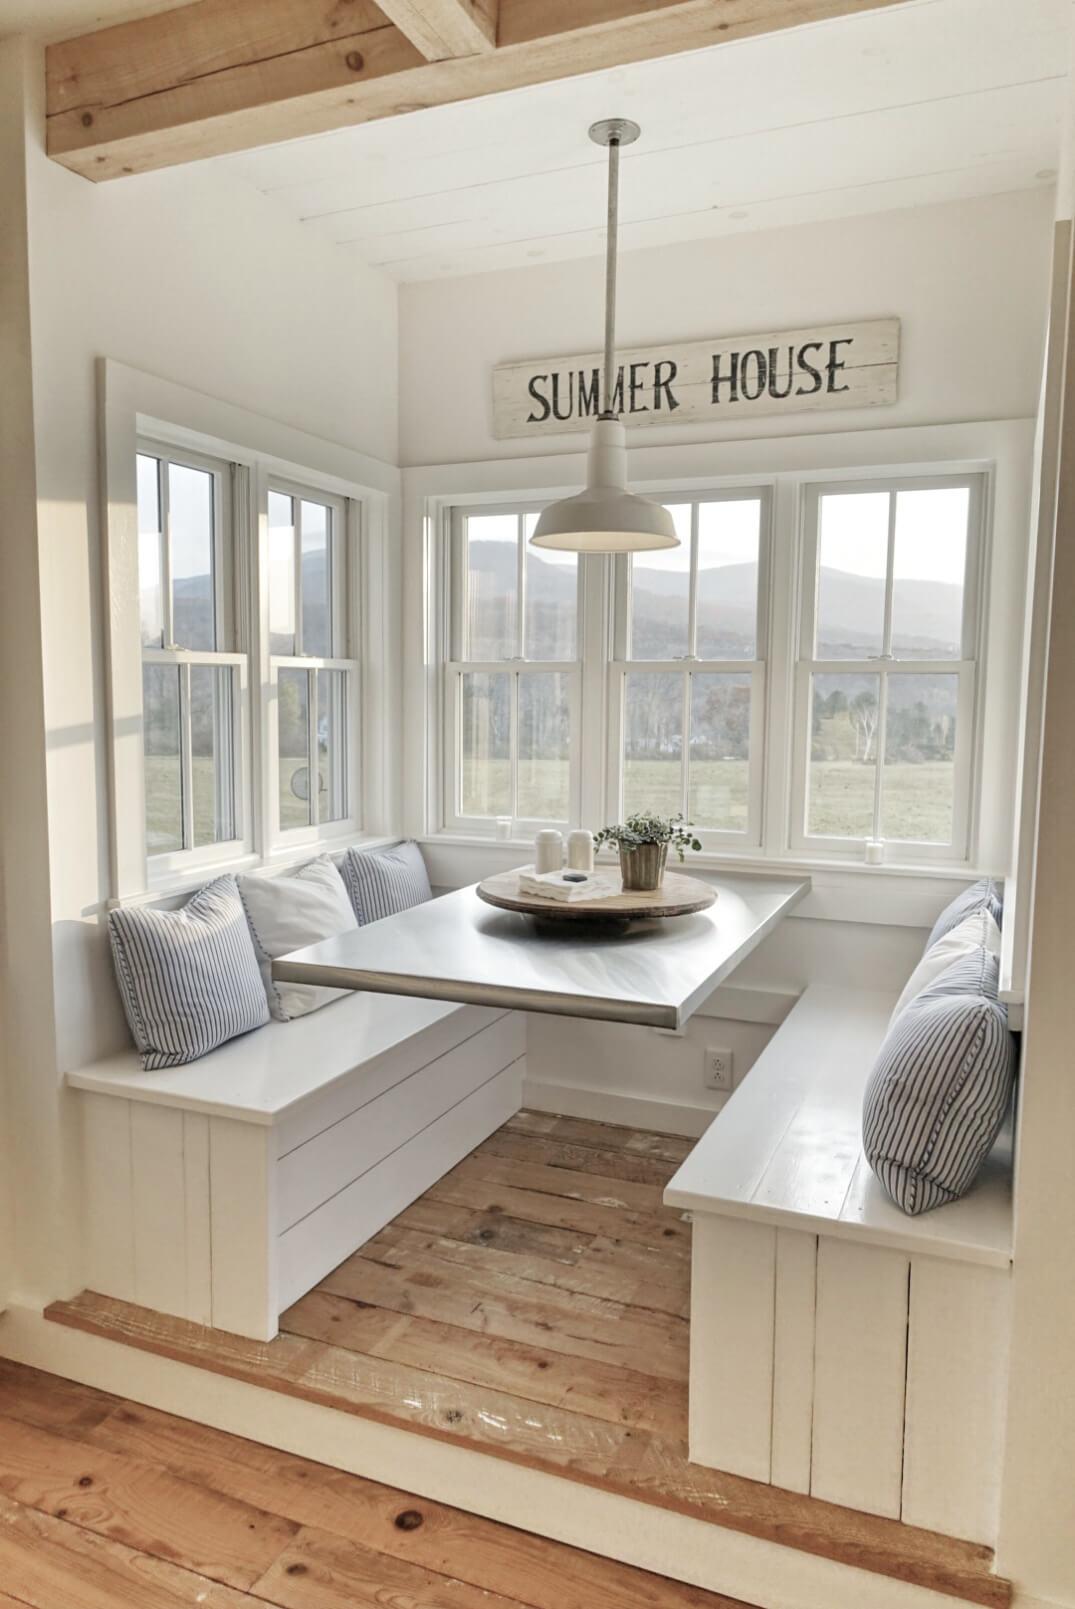 32 Best Beach House Interior Design Ideas and Decorations ... on House Interior Ideas  id=16448